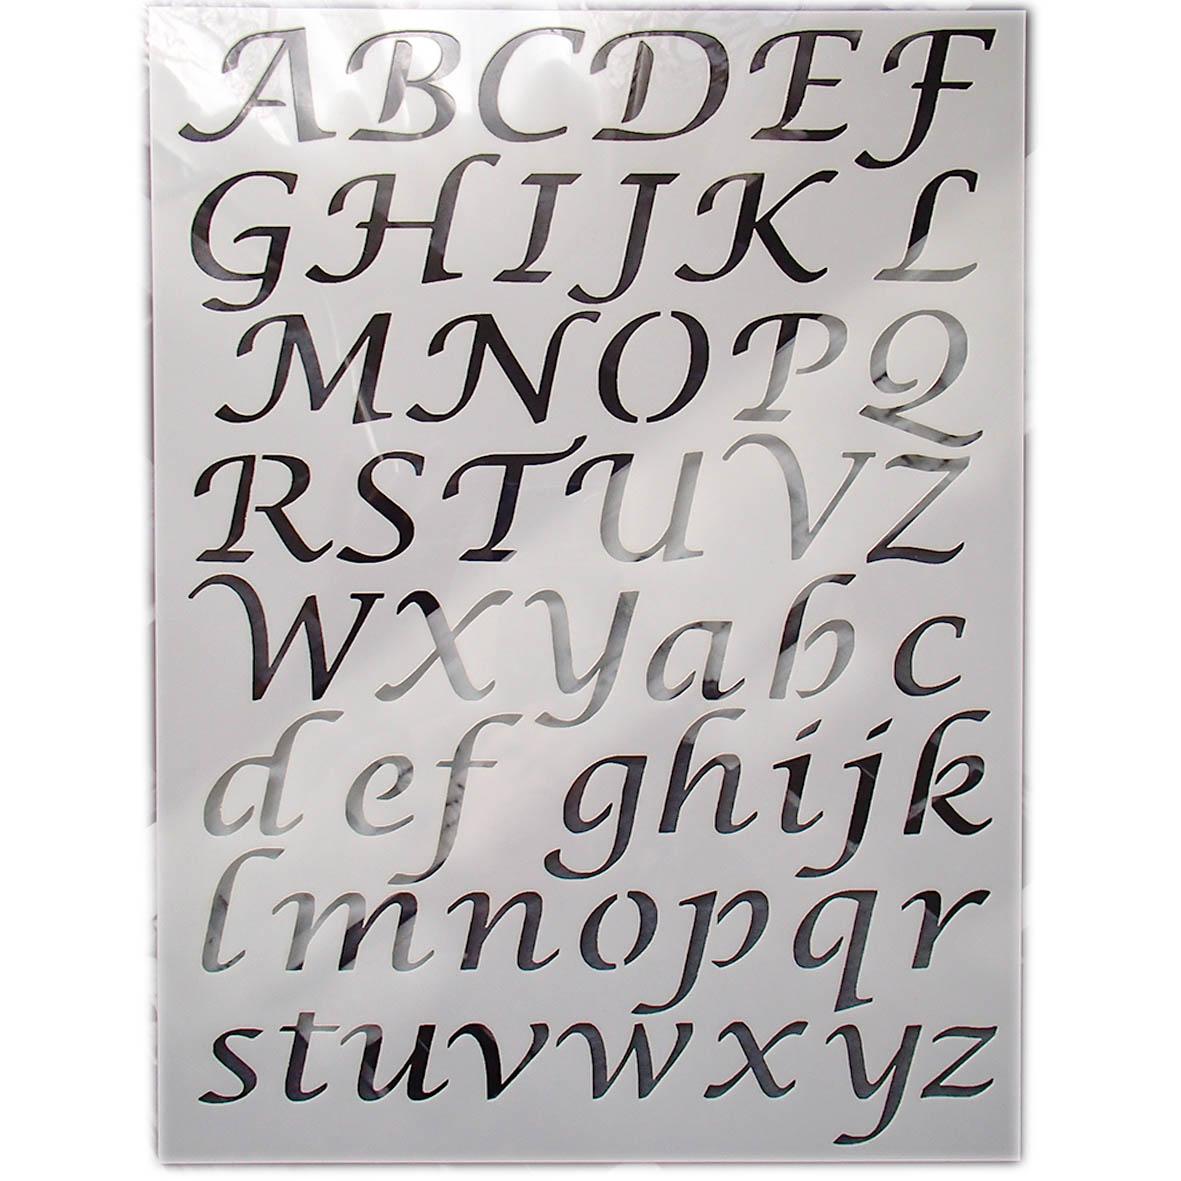 Pin pochoir phrase gratuit imprimer graffiti ajilbabcom portal on pinterest - Pochoir lettre a imprimer gratuit ...